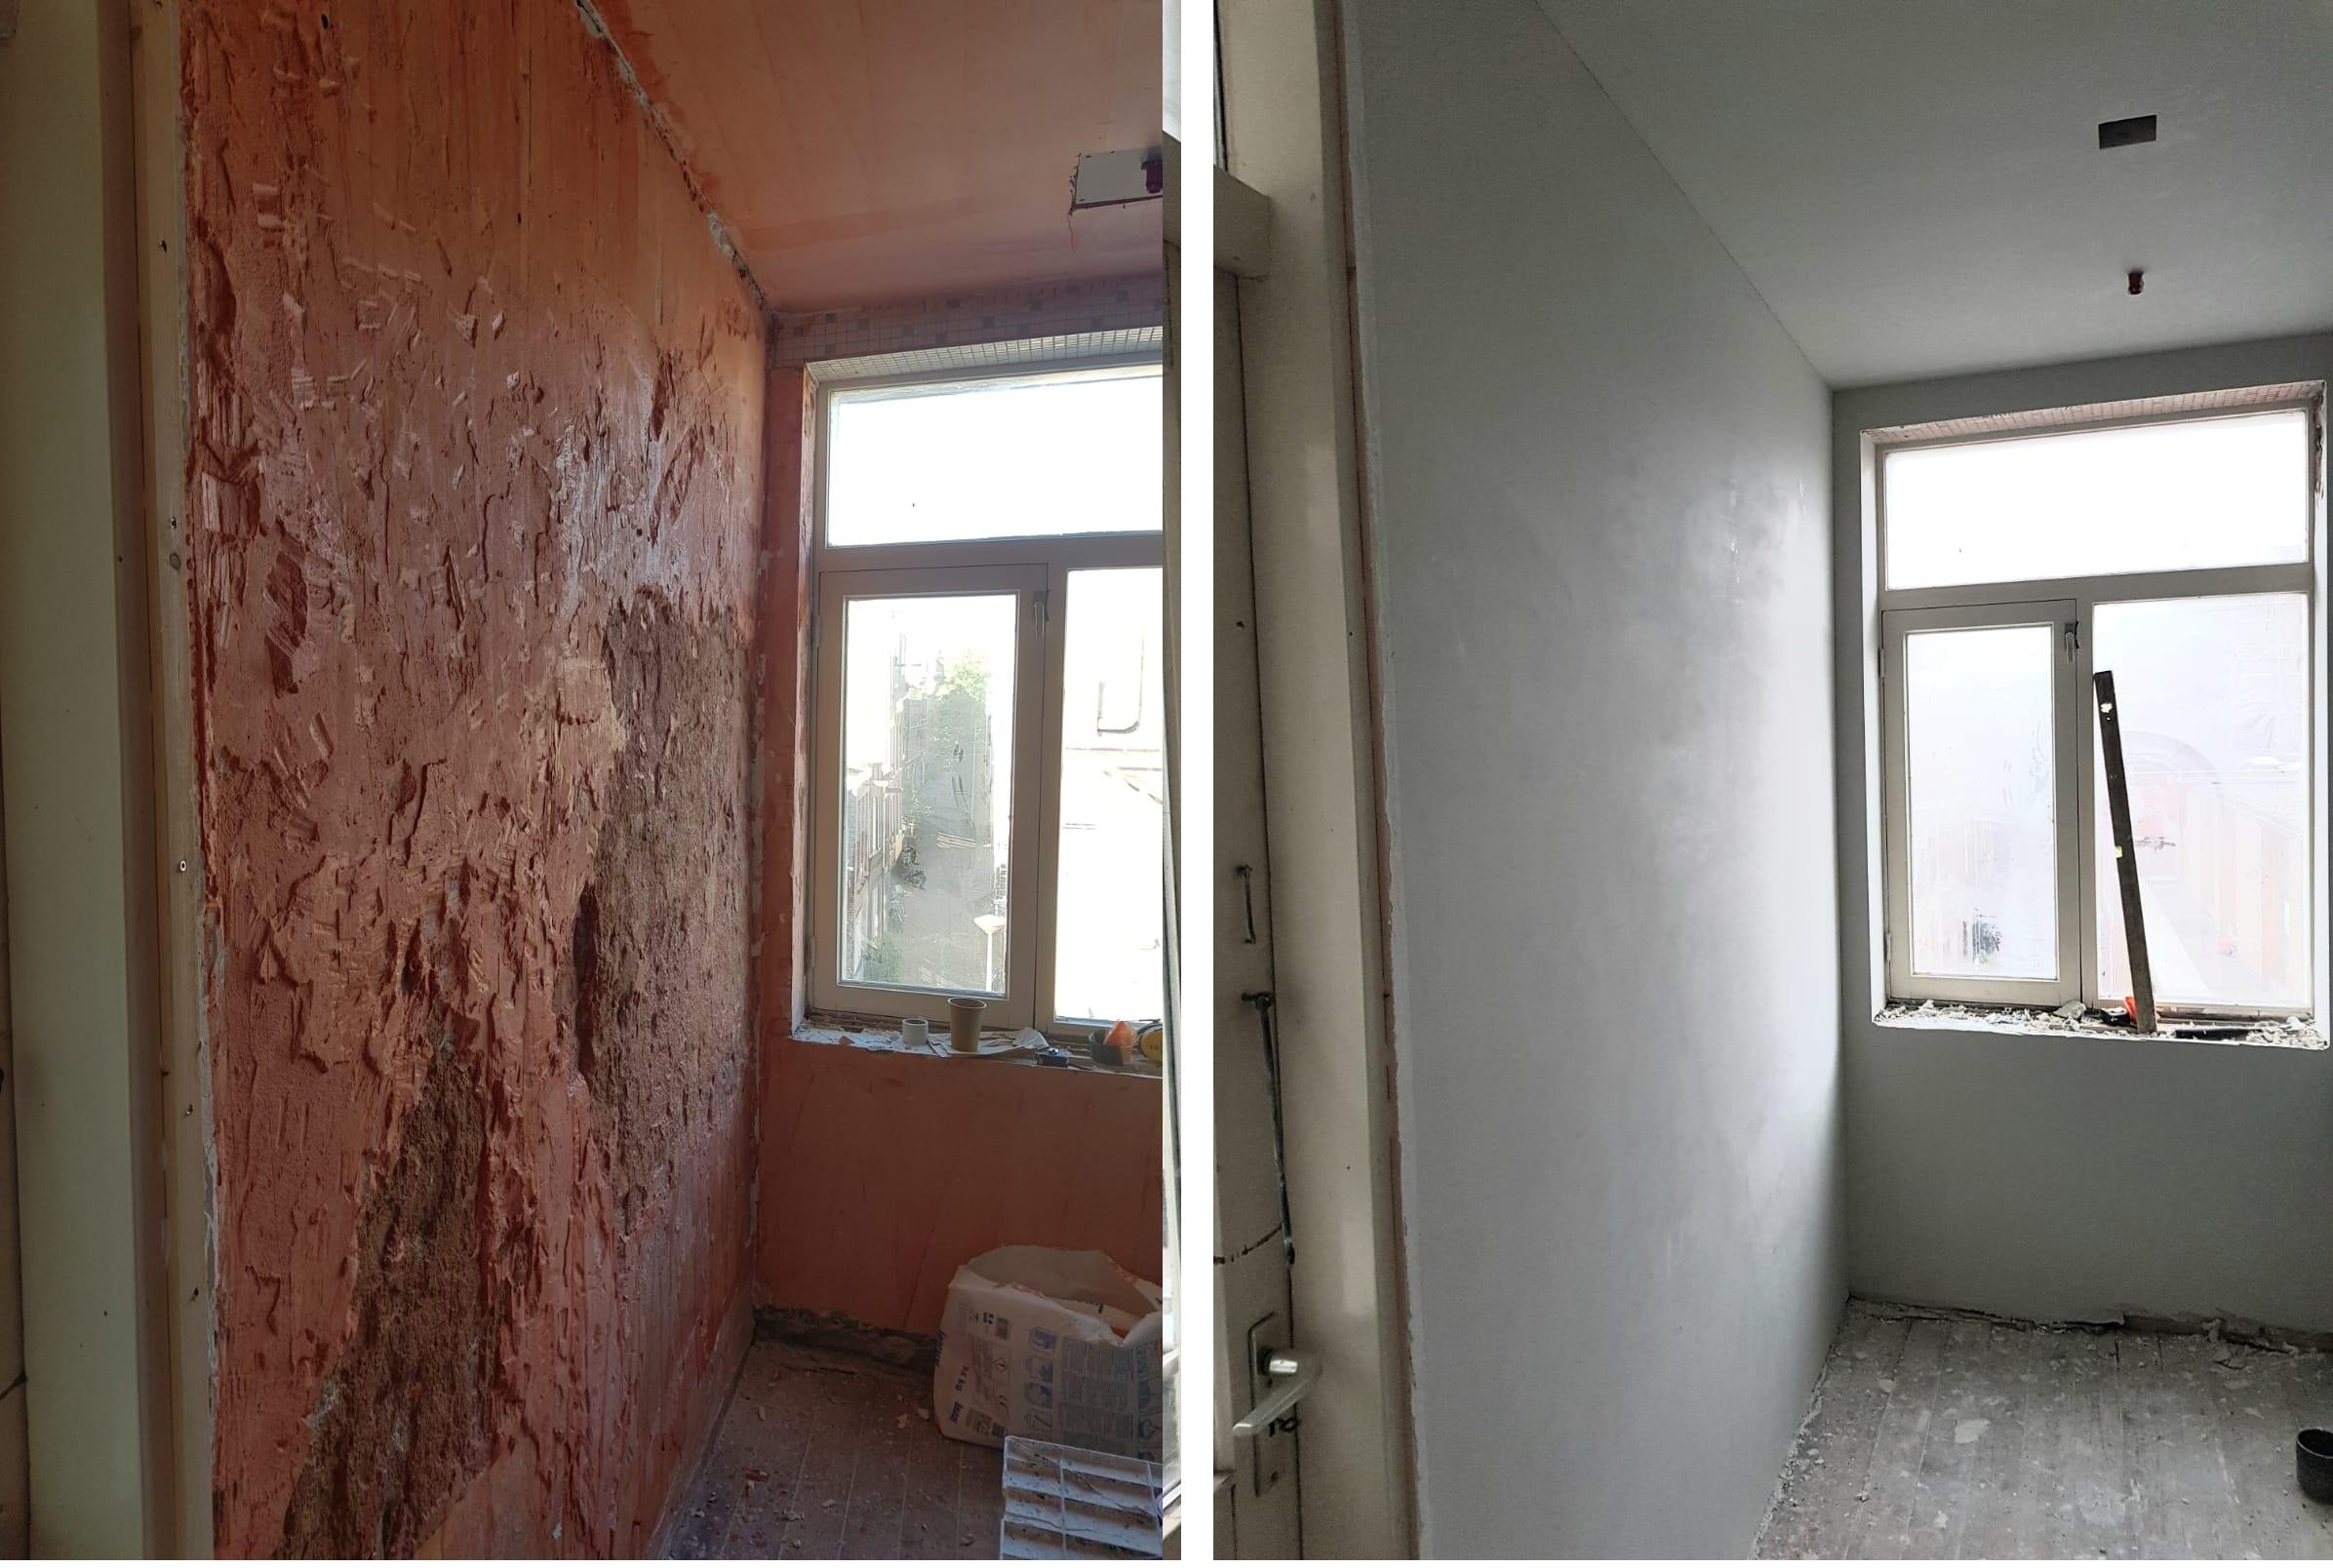 slaapkamer vooraf en achter